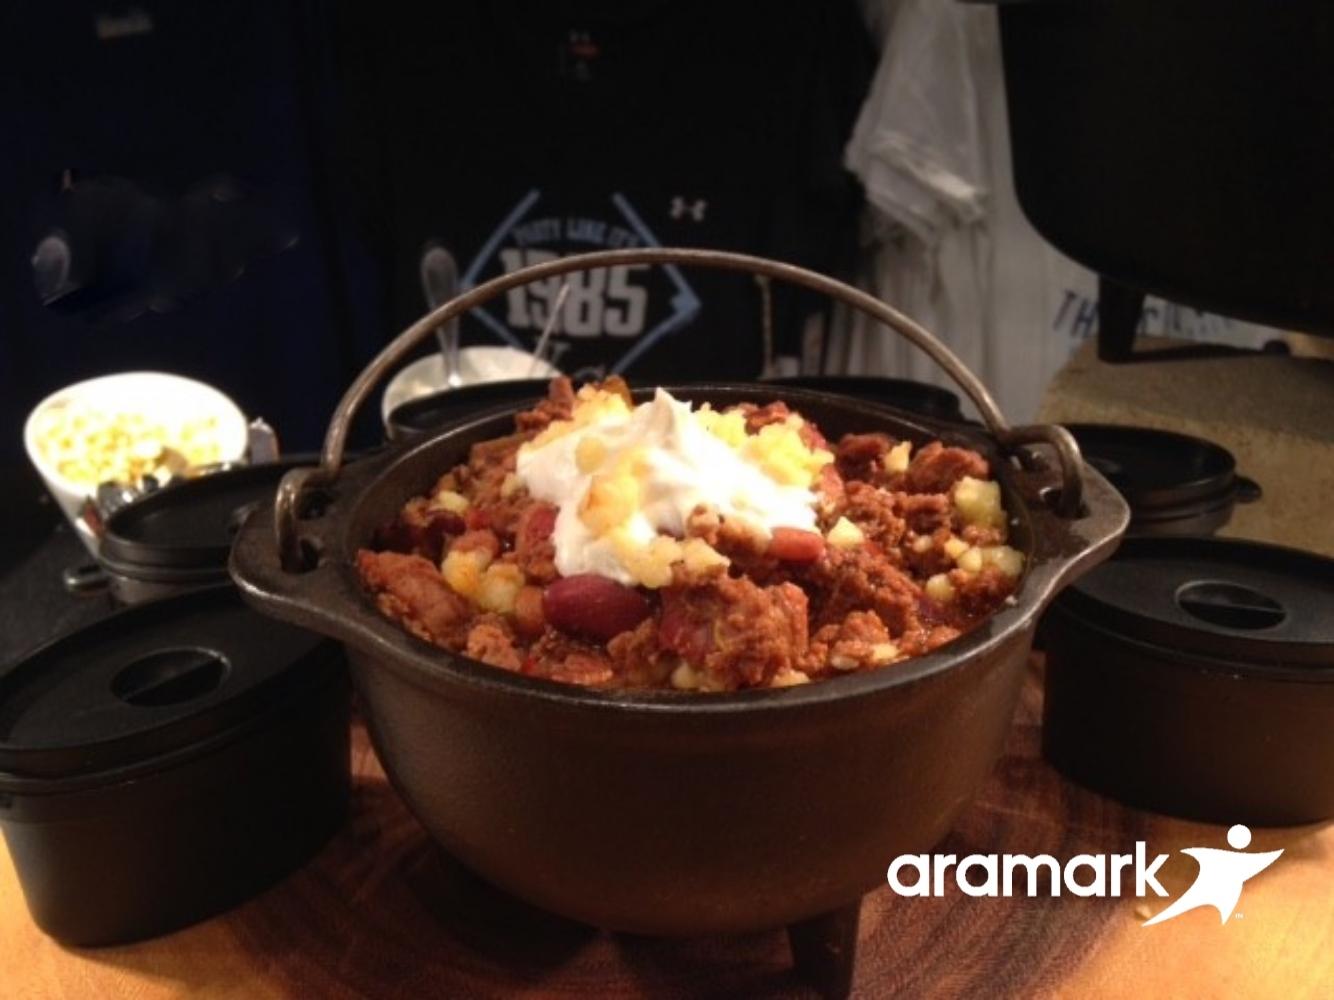 Homemade turkey chili (Aramark Sports)